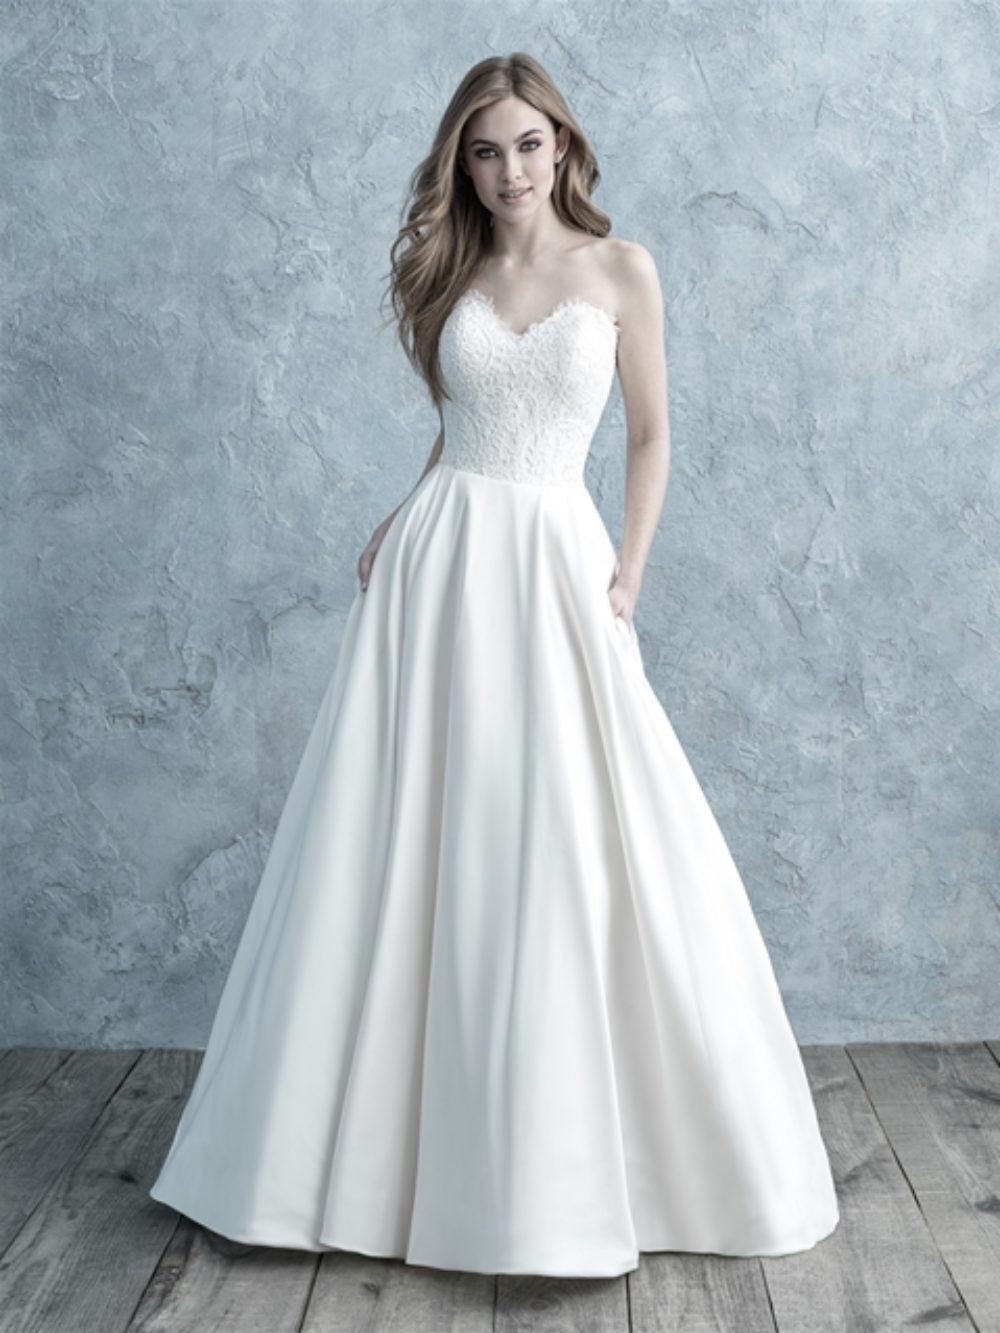 b27204ce95e67 Allure Wedding Dresses and Couture Allure at Precious Memories